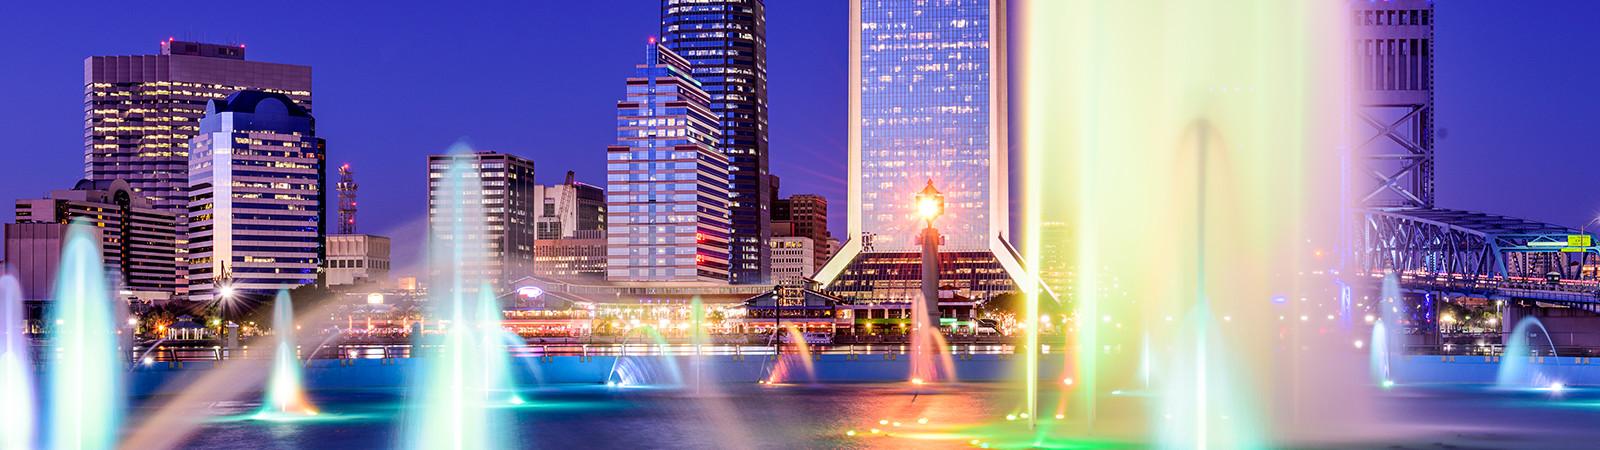 Friendship Fountain in Jacksonville